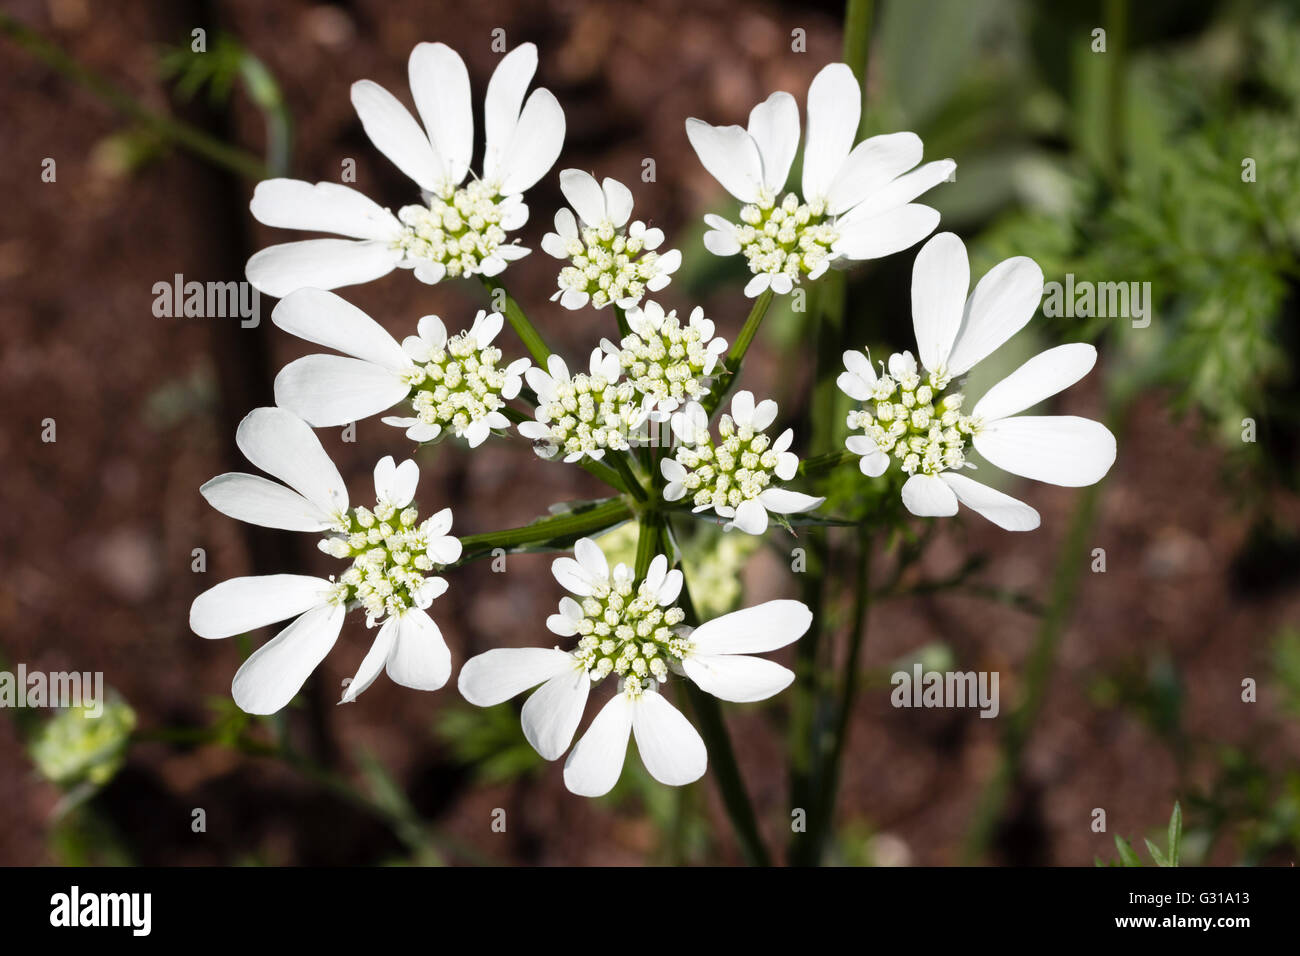 Dramatic white flower head of the hardy annual umbellifer, Orlaya grandiflora Stock Photo